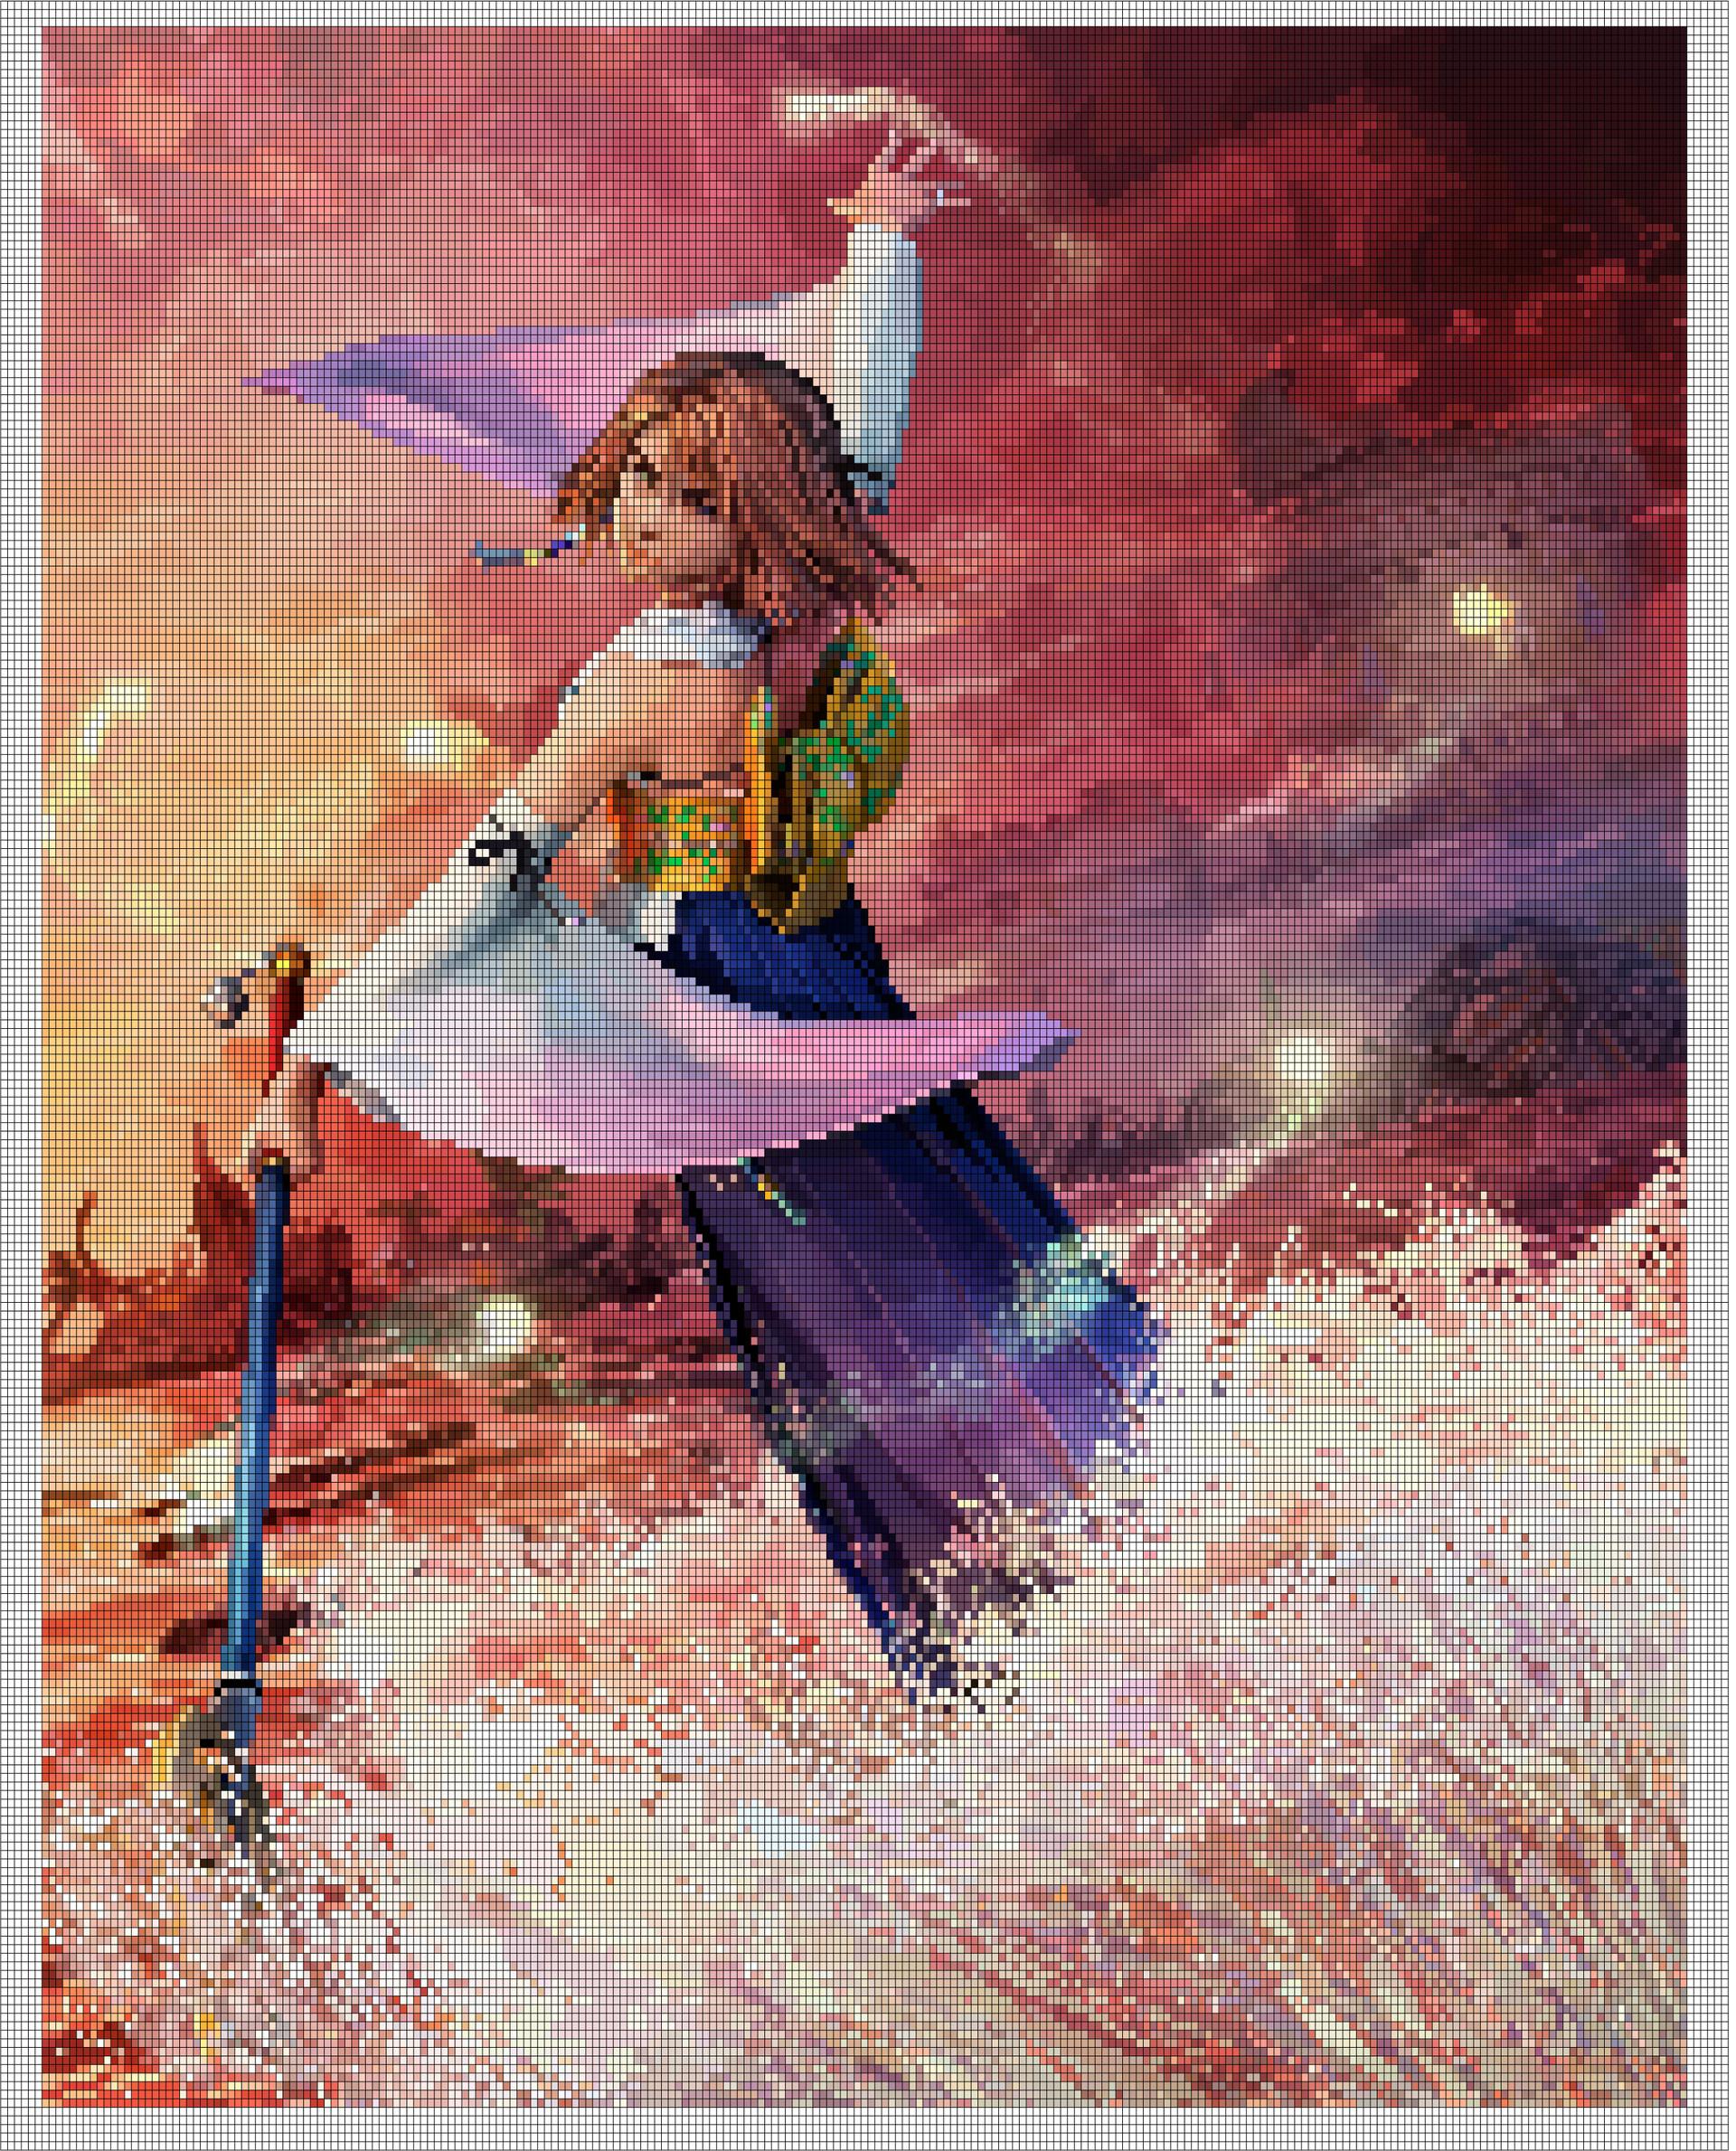 Artstation Pixel Art Yuna Final Fantasy X Erica Lucia Maekawa Rigolo